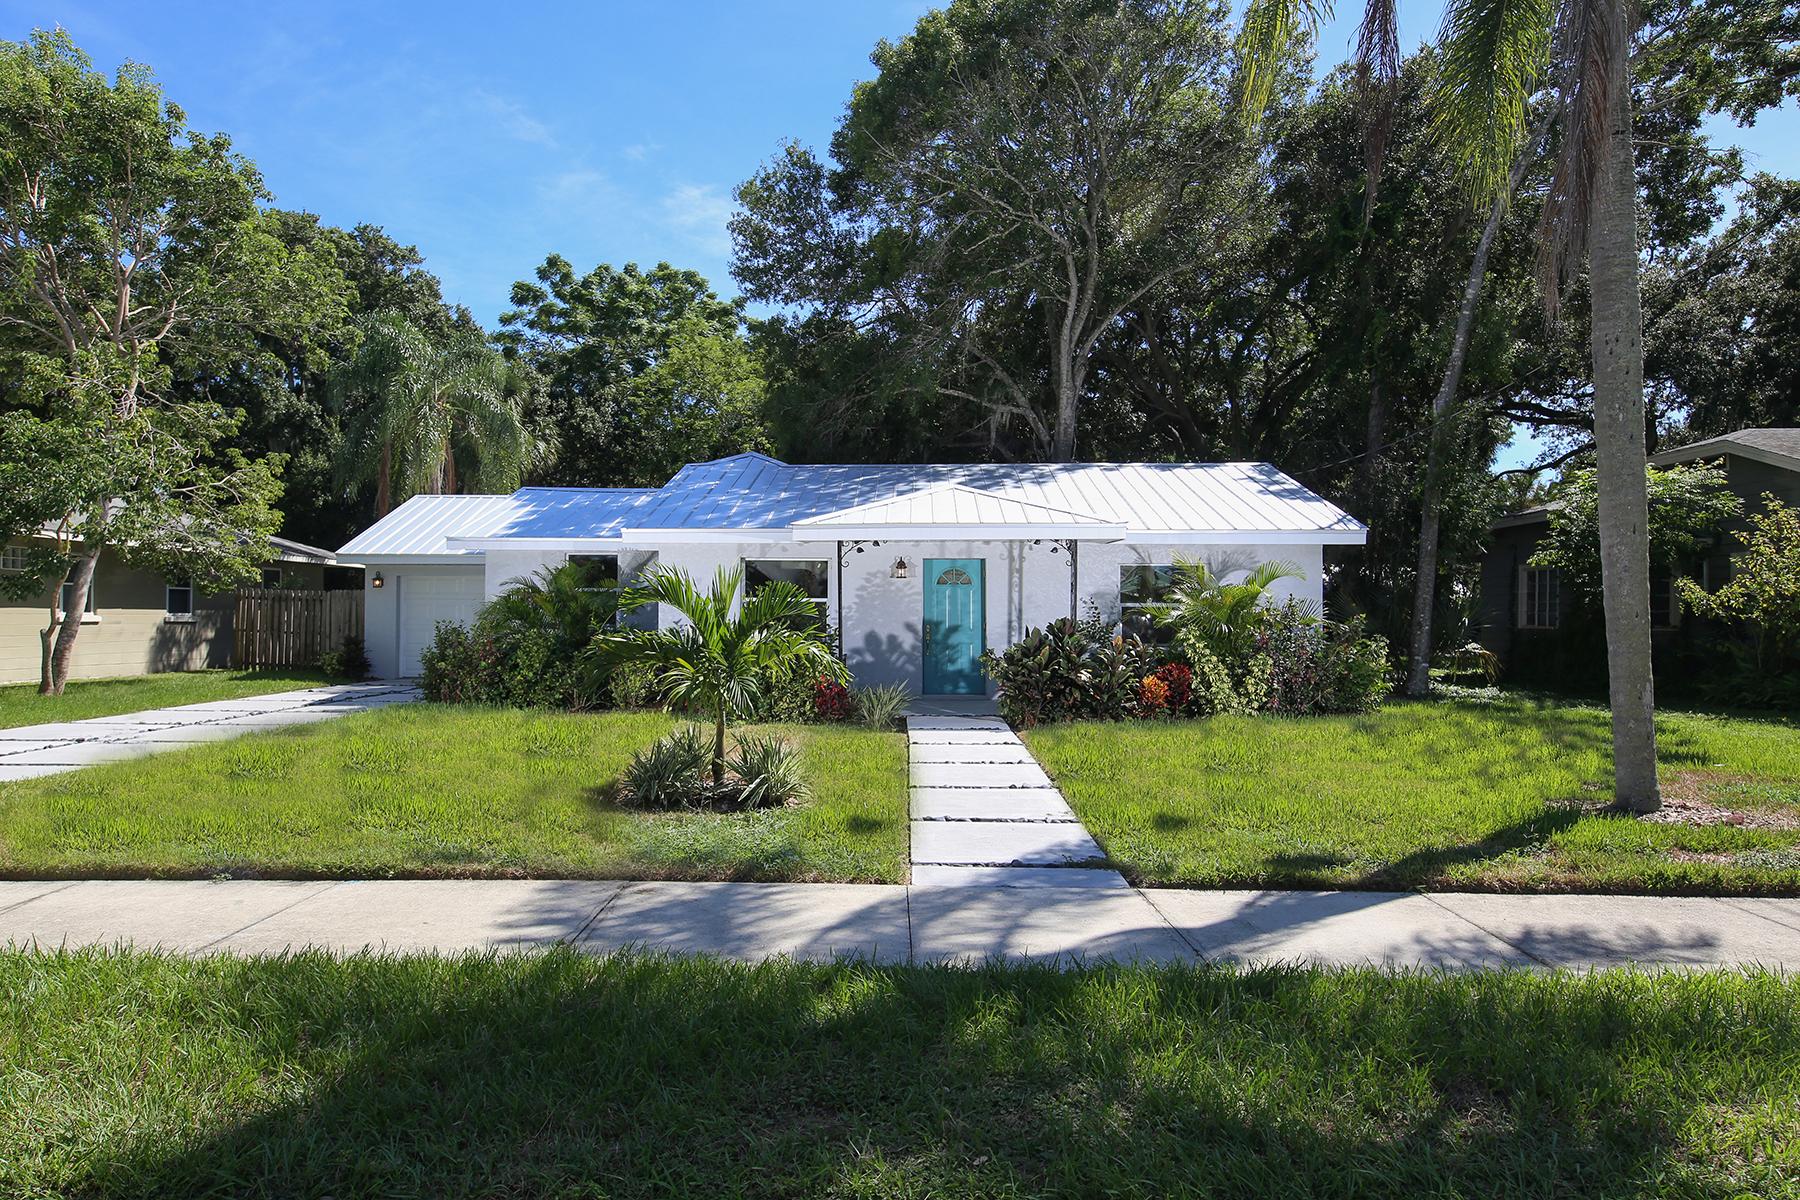 獨棟家庭住宅 為 出售 在 SCHINDLER SUBDIVISION 1754 7th St Sarasota, 佛羅里達州, 34236 美國